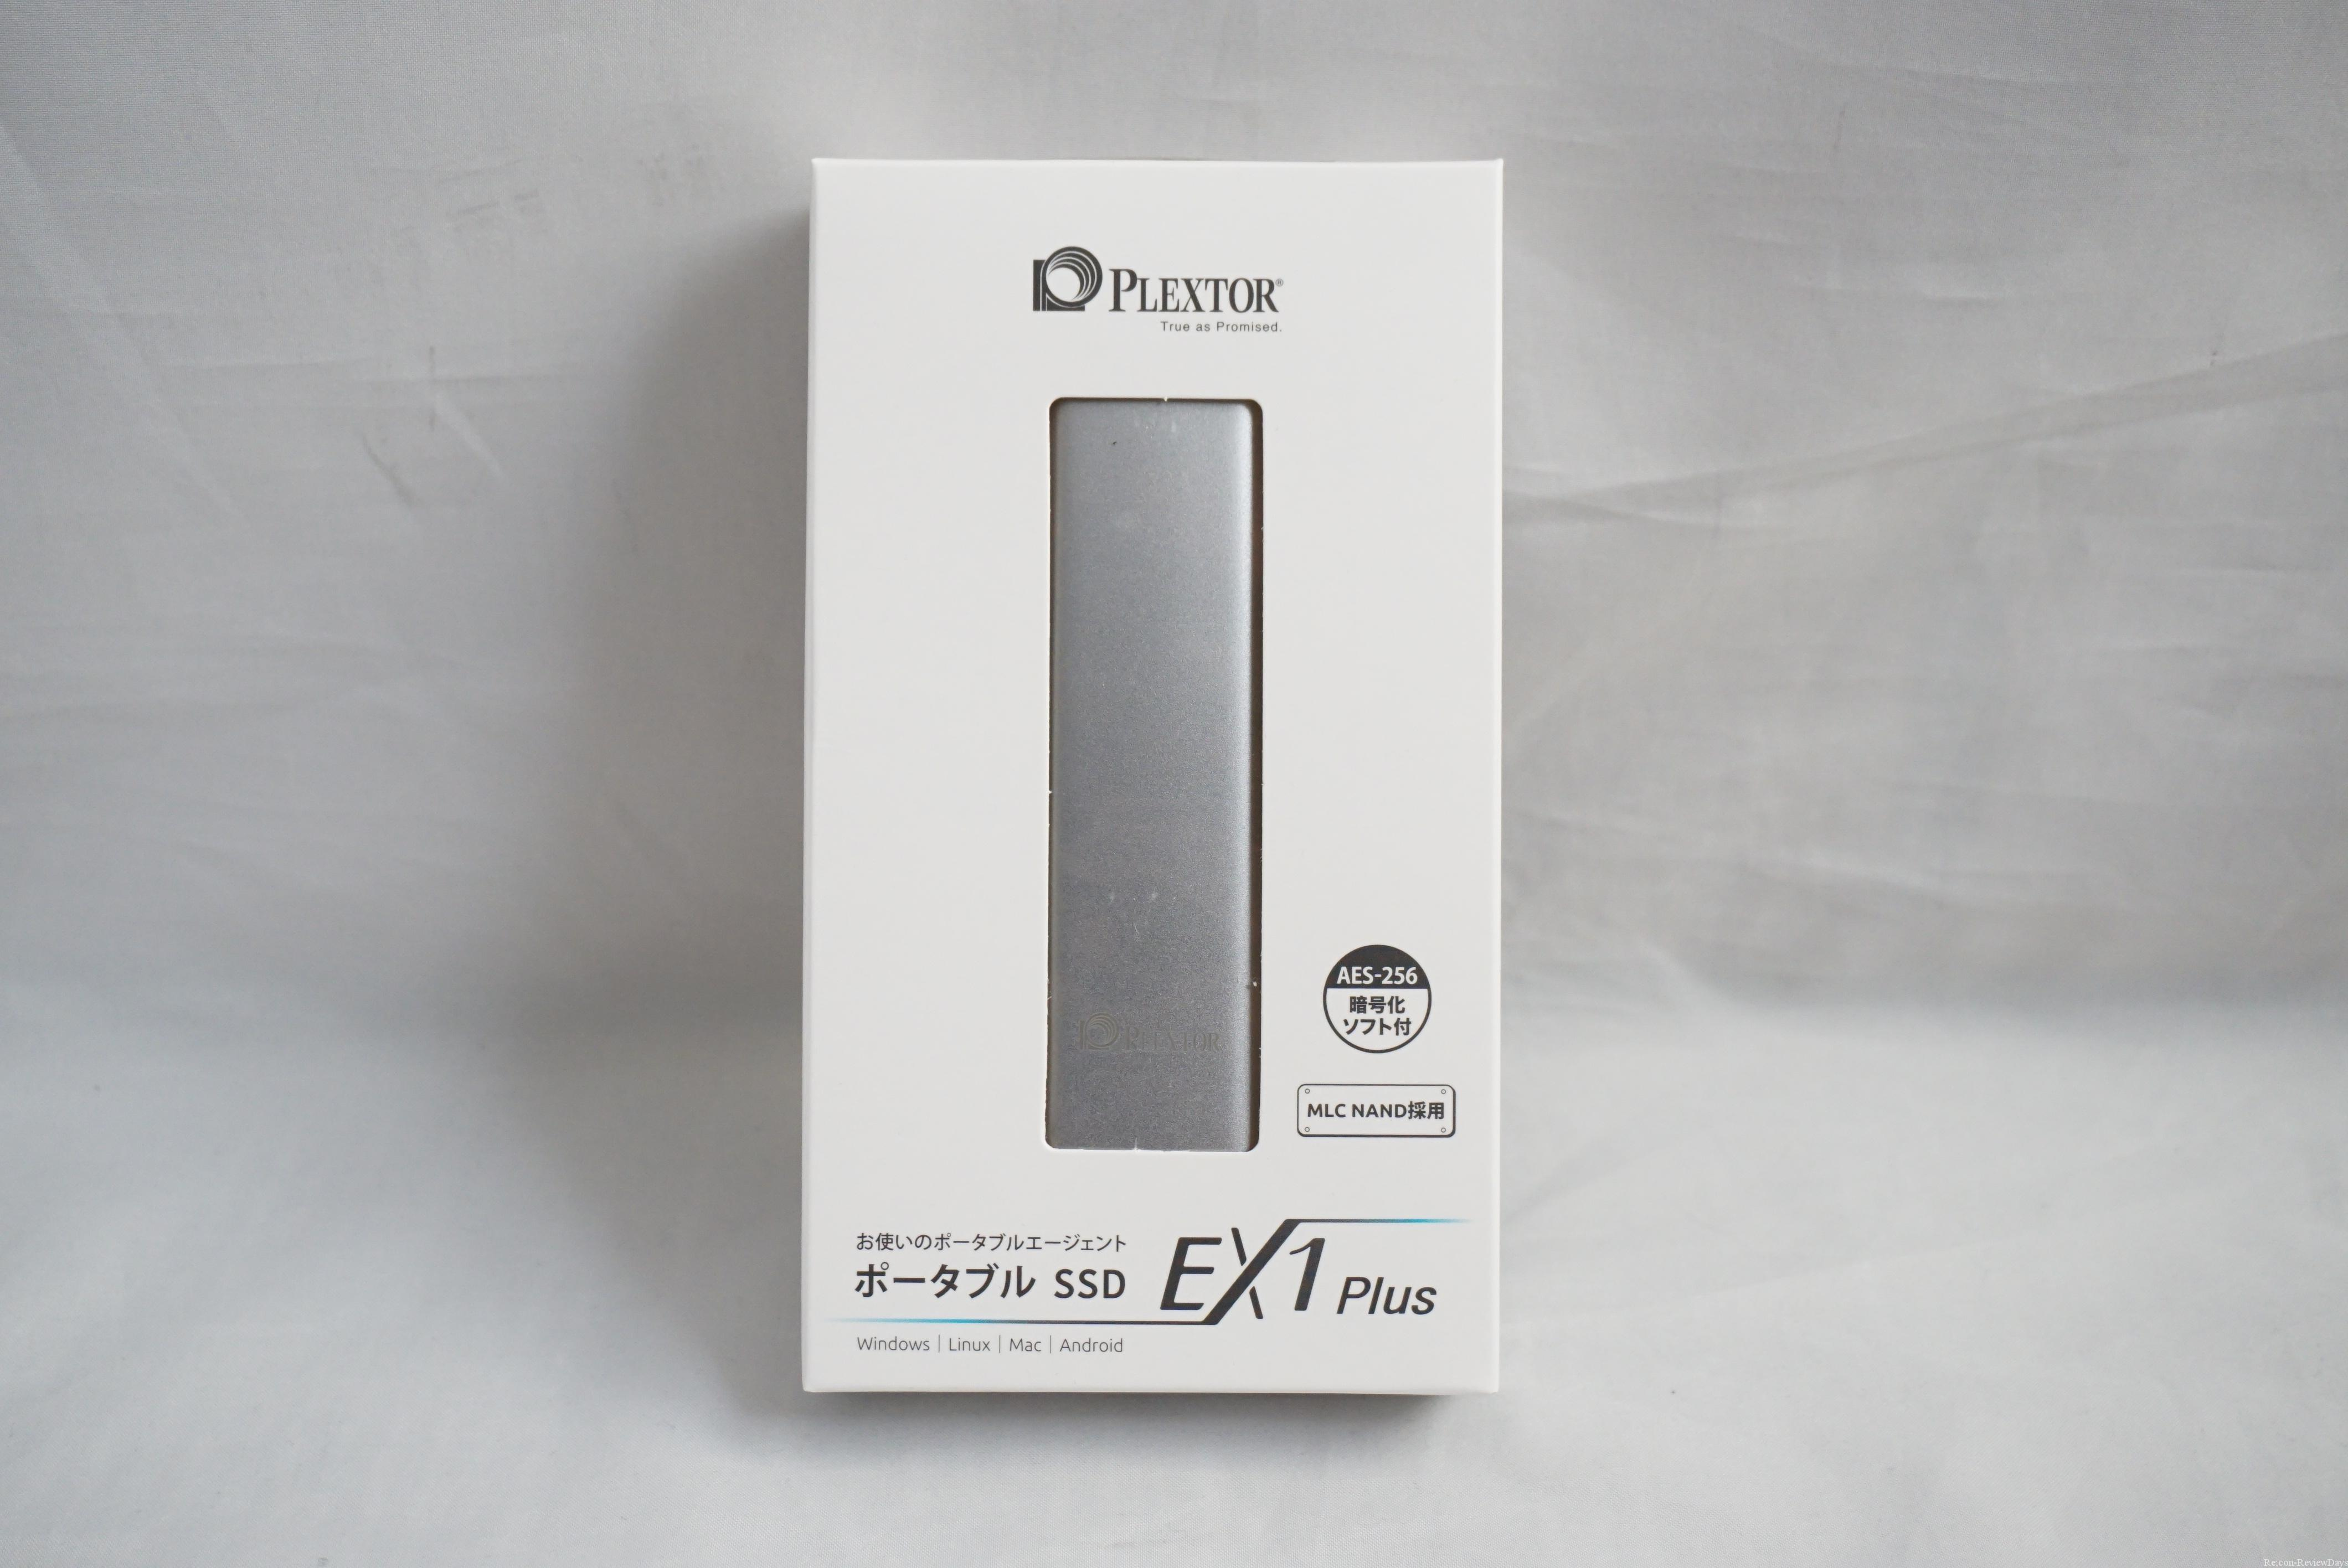 Plextor製のUSB 3.1 Gen2対応のポータブルSSD 128GB「EX1-PLUS 128G」のパフォーマンスを検証する #Plextor #TypeC #SSD #自作PC